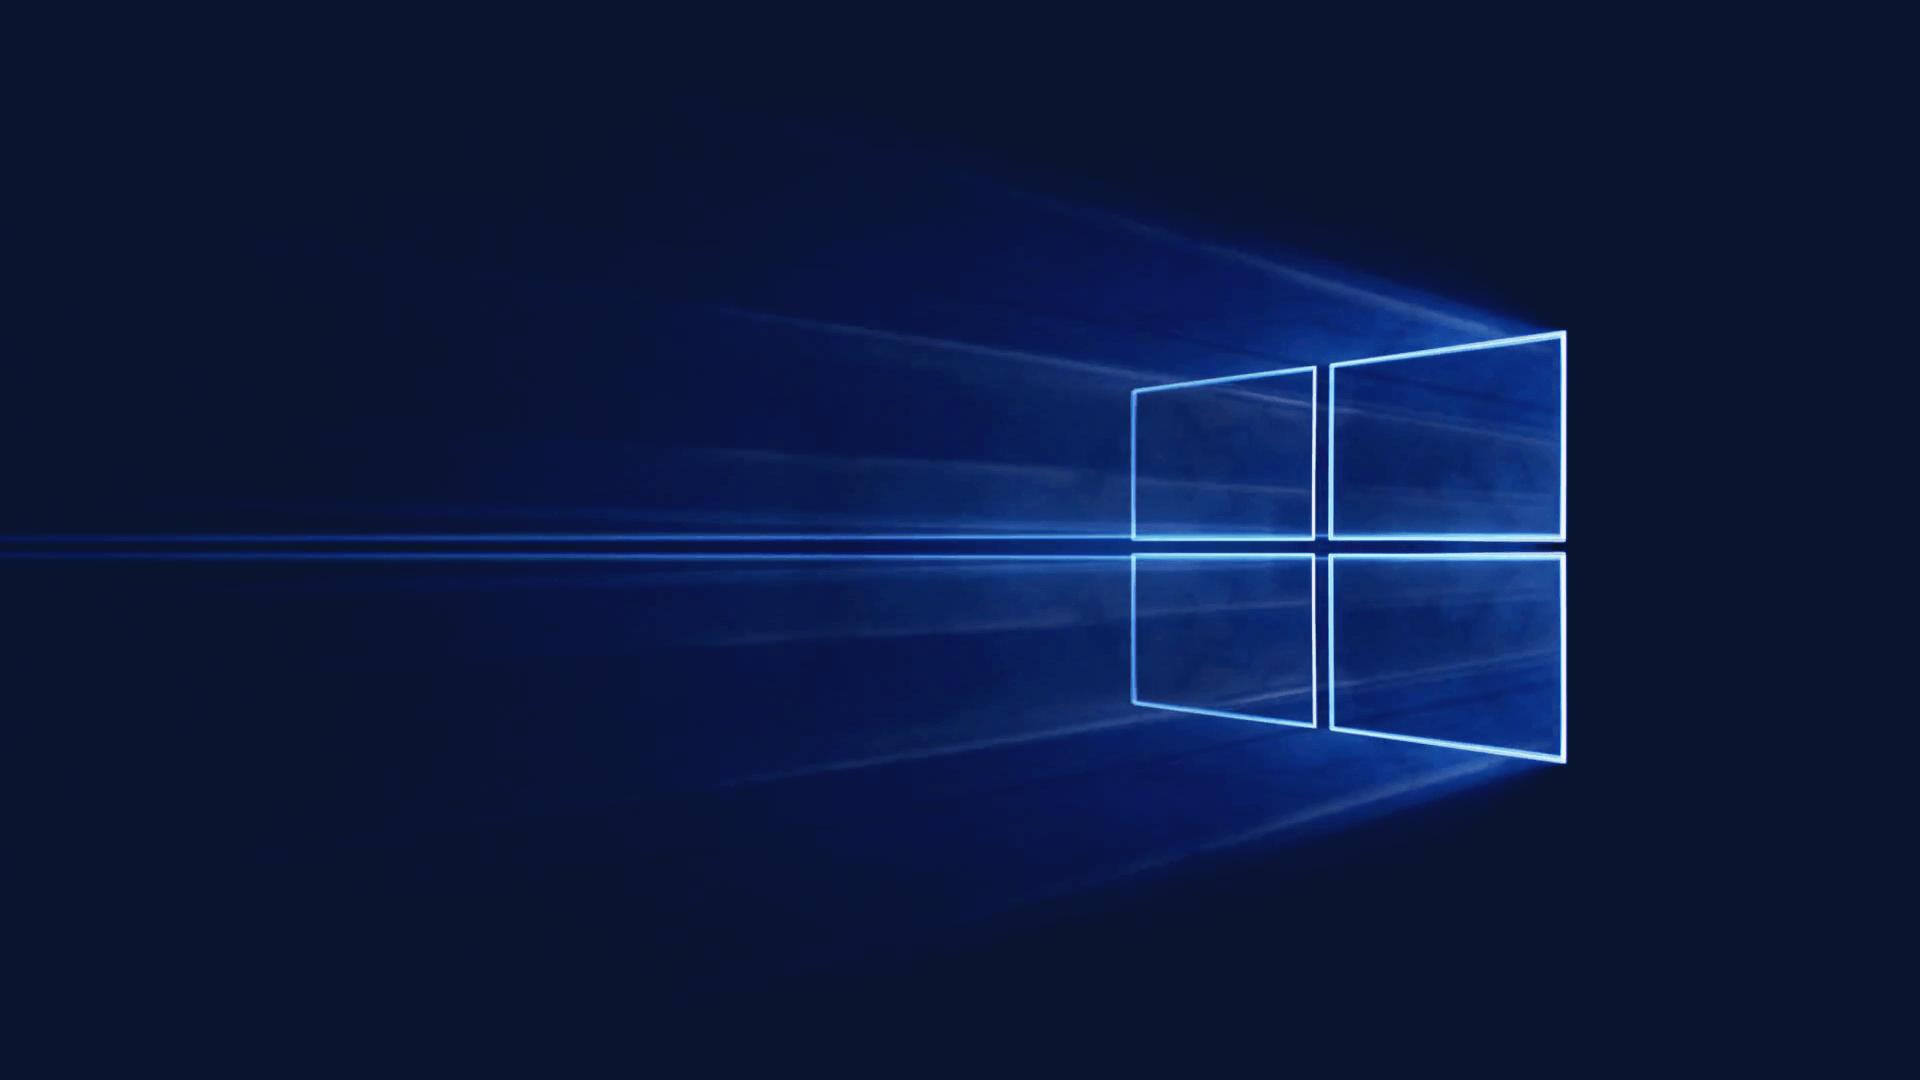 Windows 10 Hero 4k Wallpapers Top Free Windows 10 Hero 4k Backgrounds Wallpaperaccess